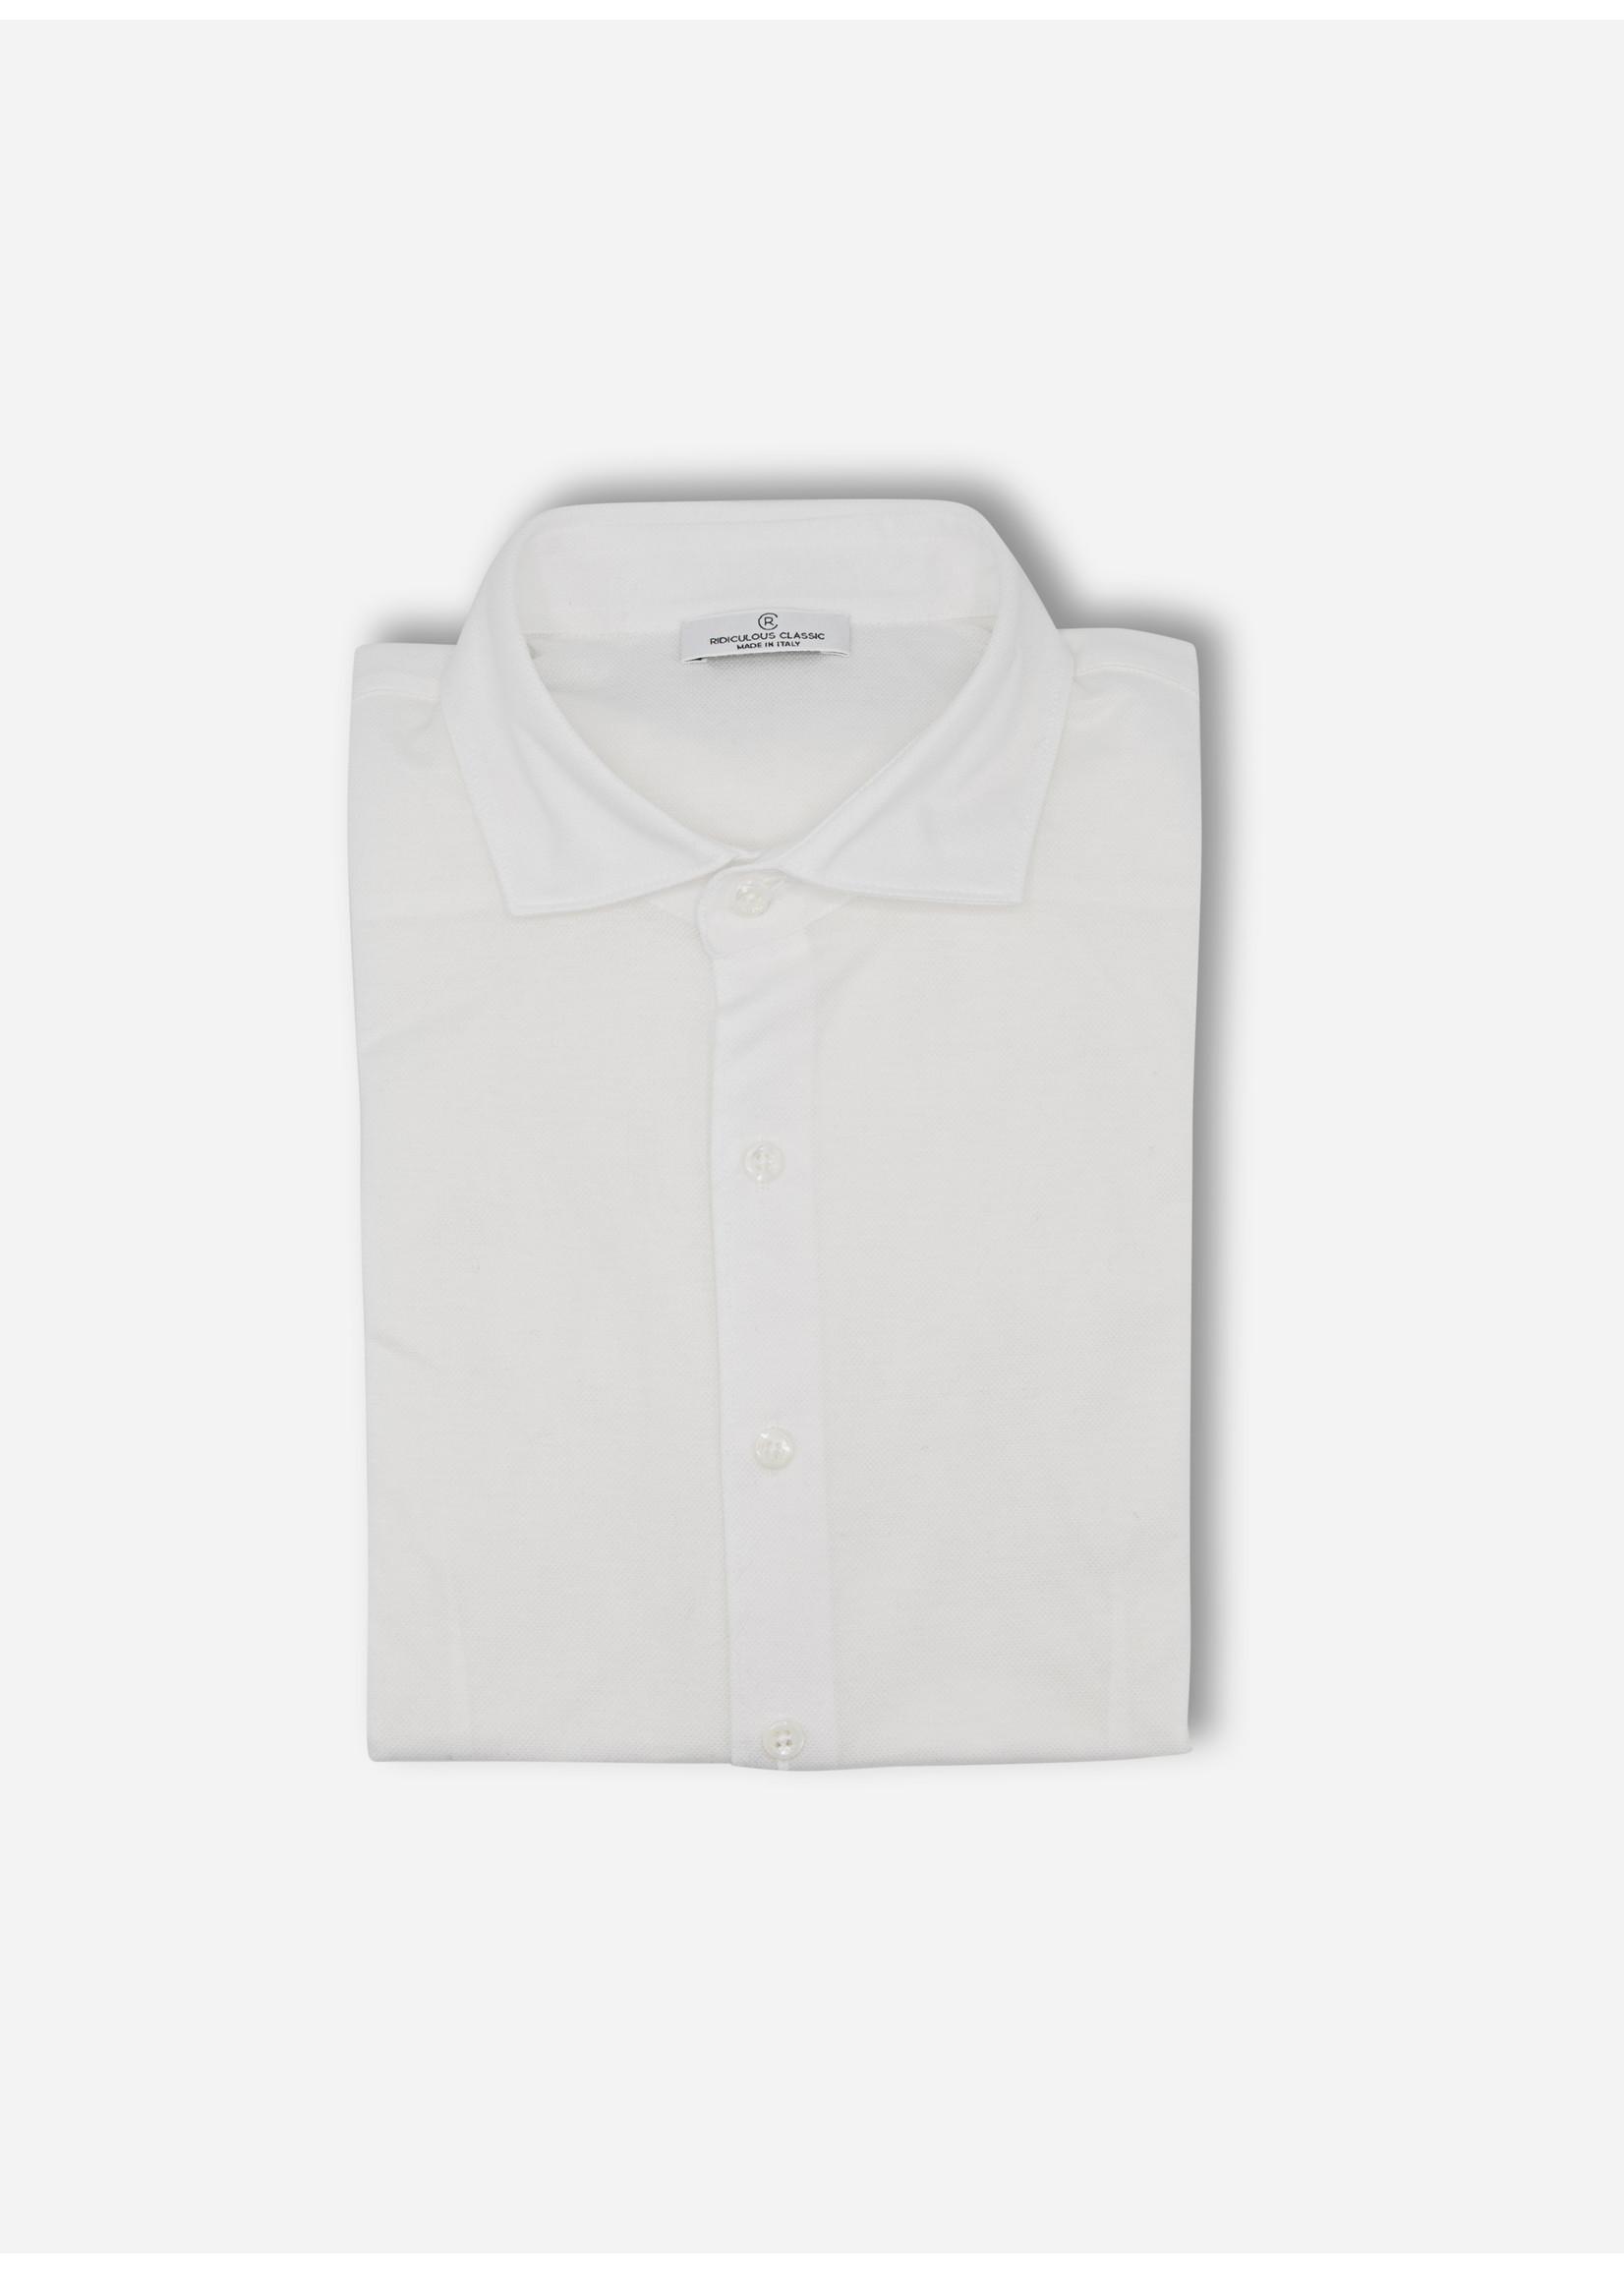 Ridiculous Classic Shirt white pique